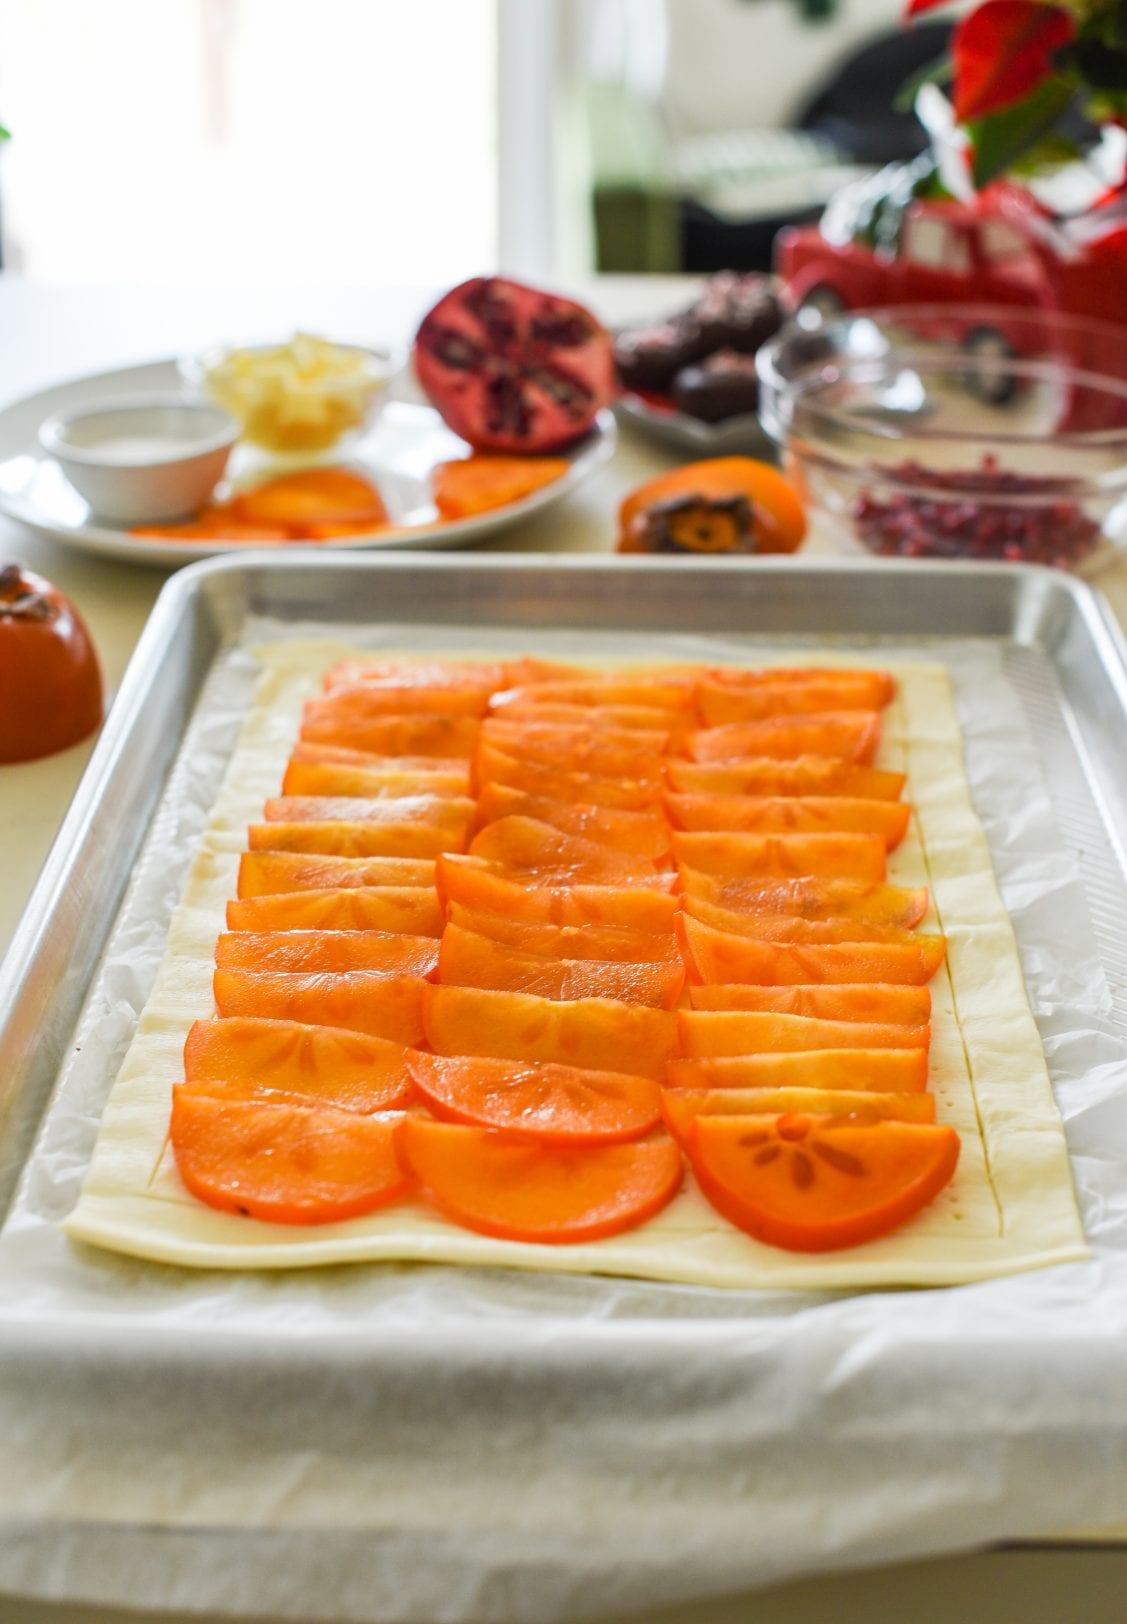 Persimmon Pomegranate Tart with Maple Mascarpone